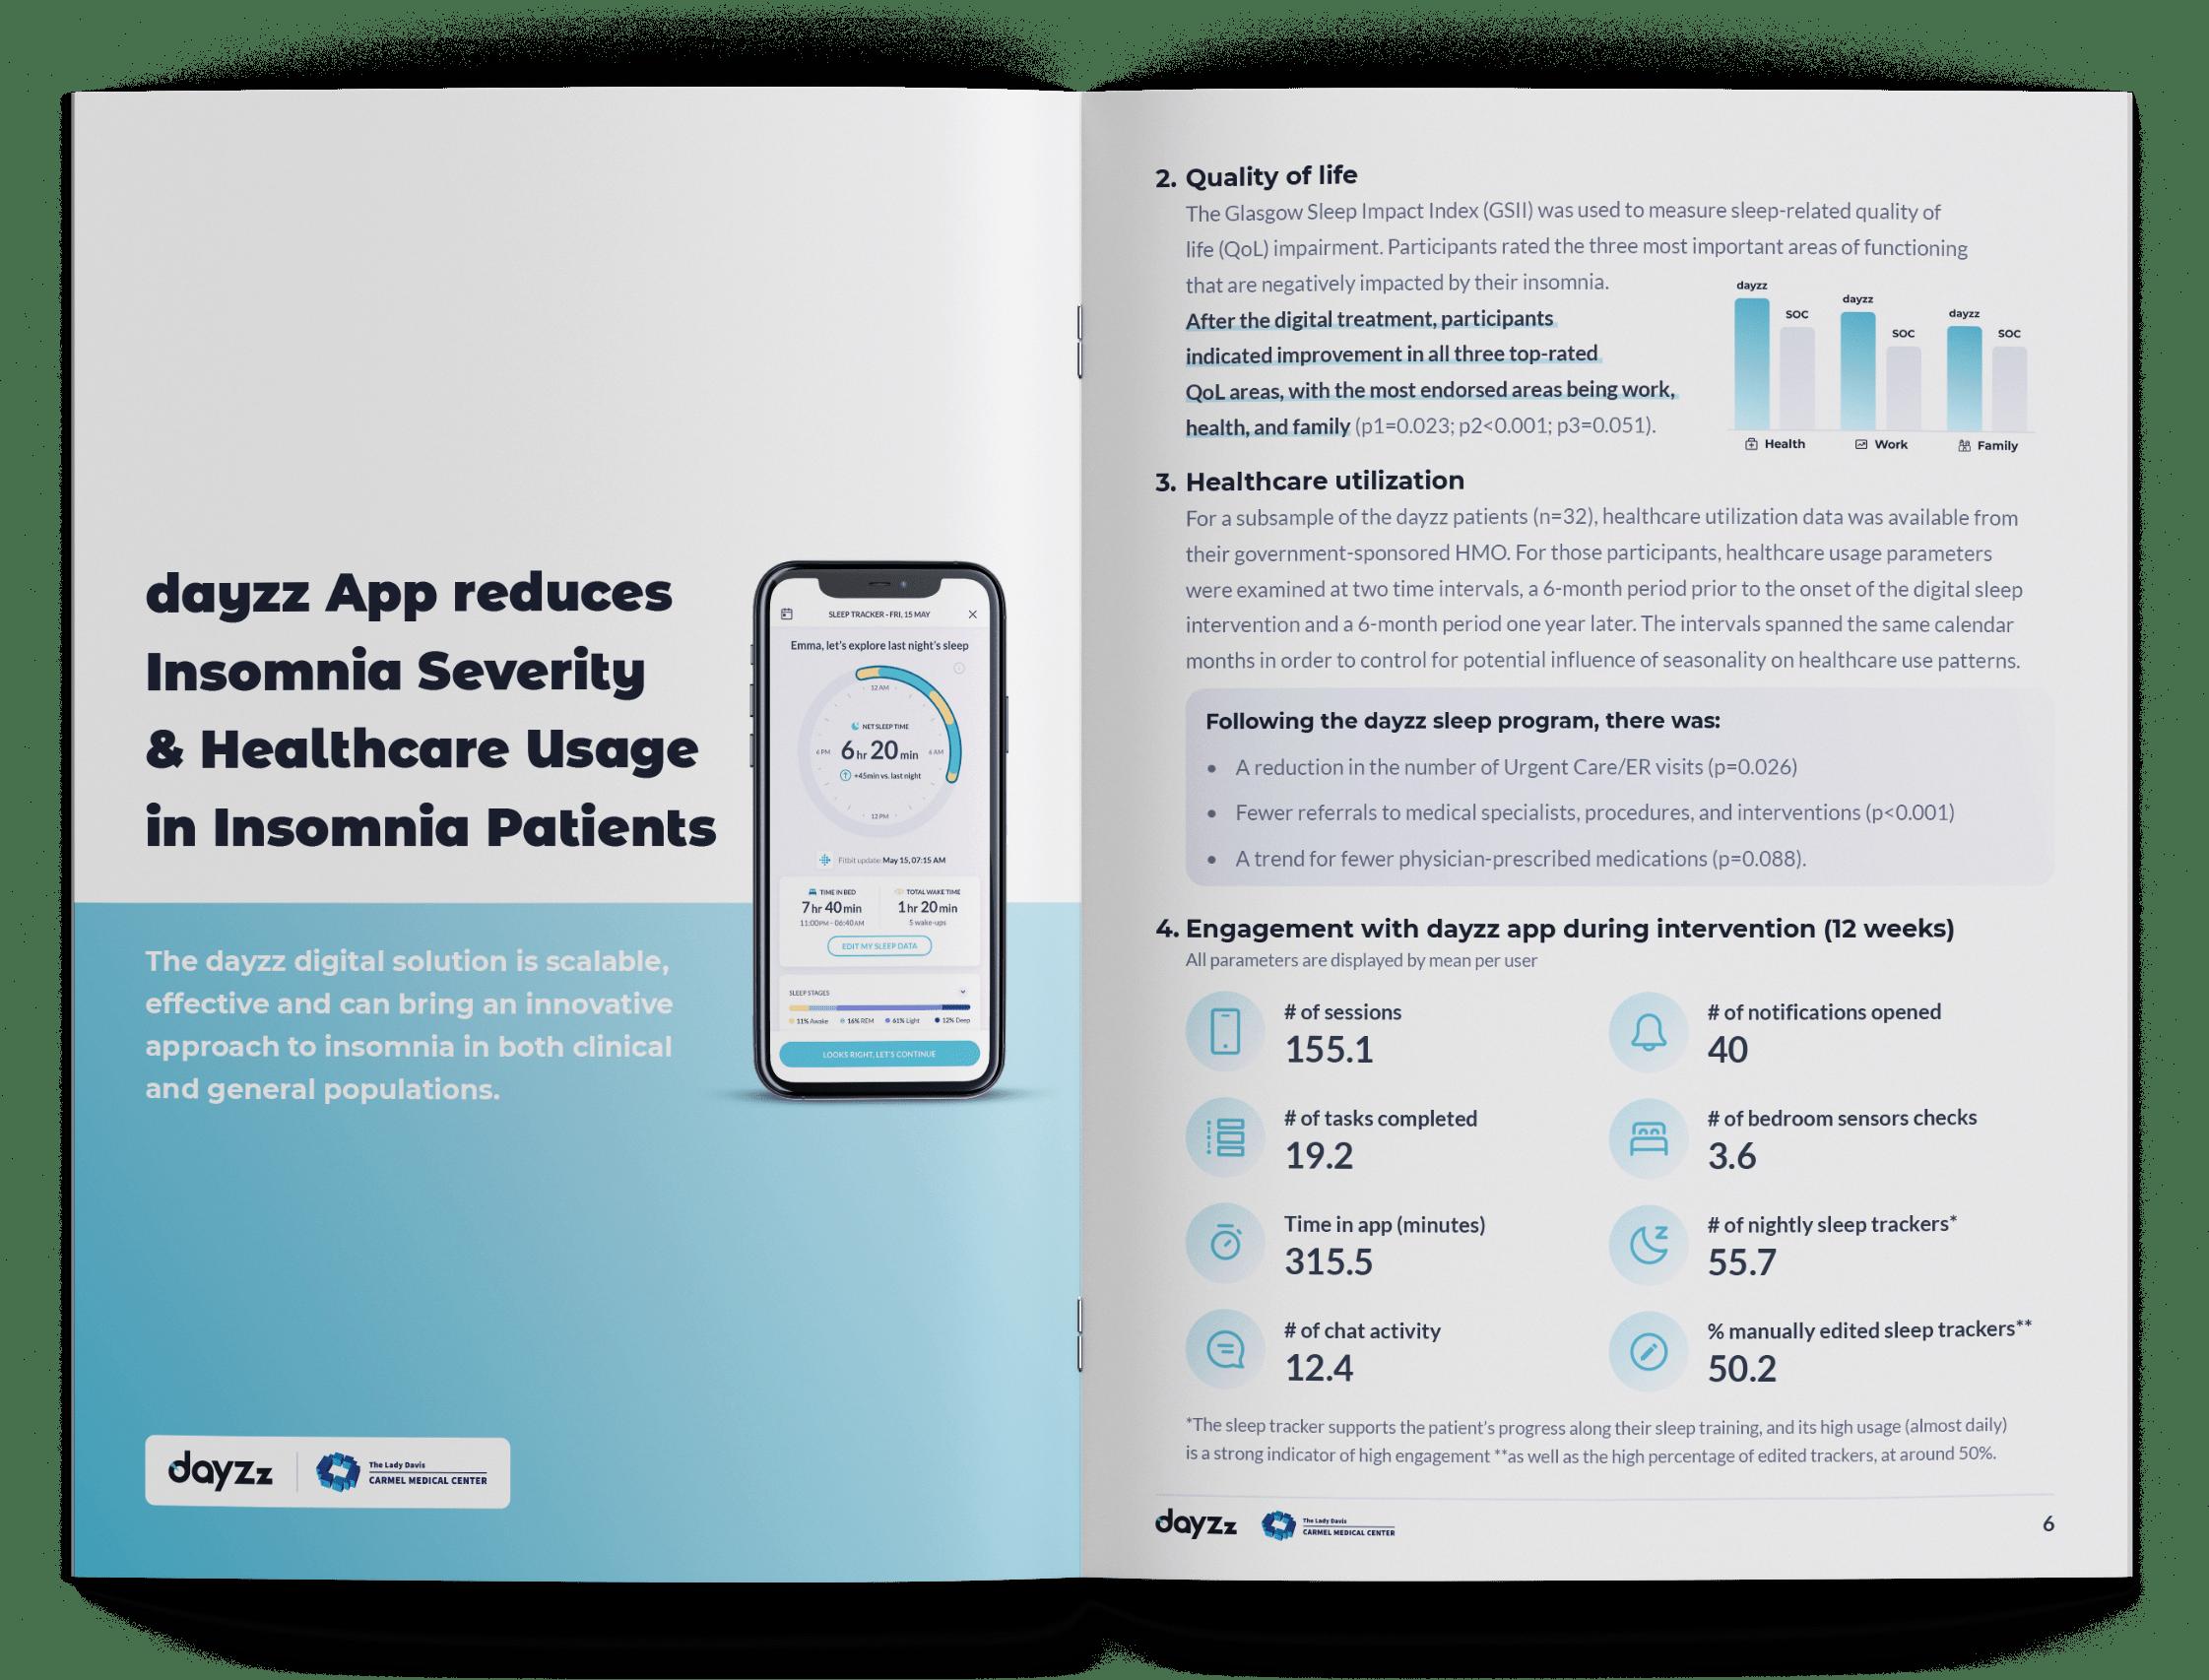 dayzz App reduces Insomnia Severity & Healthcare Usage